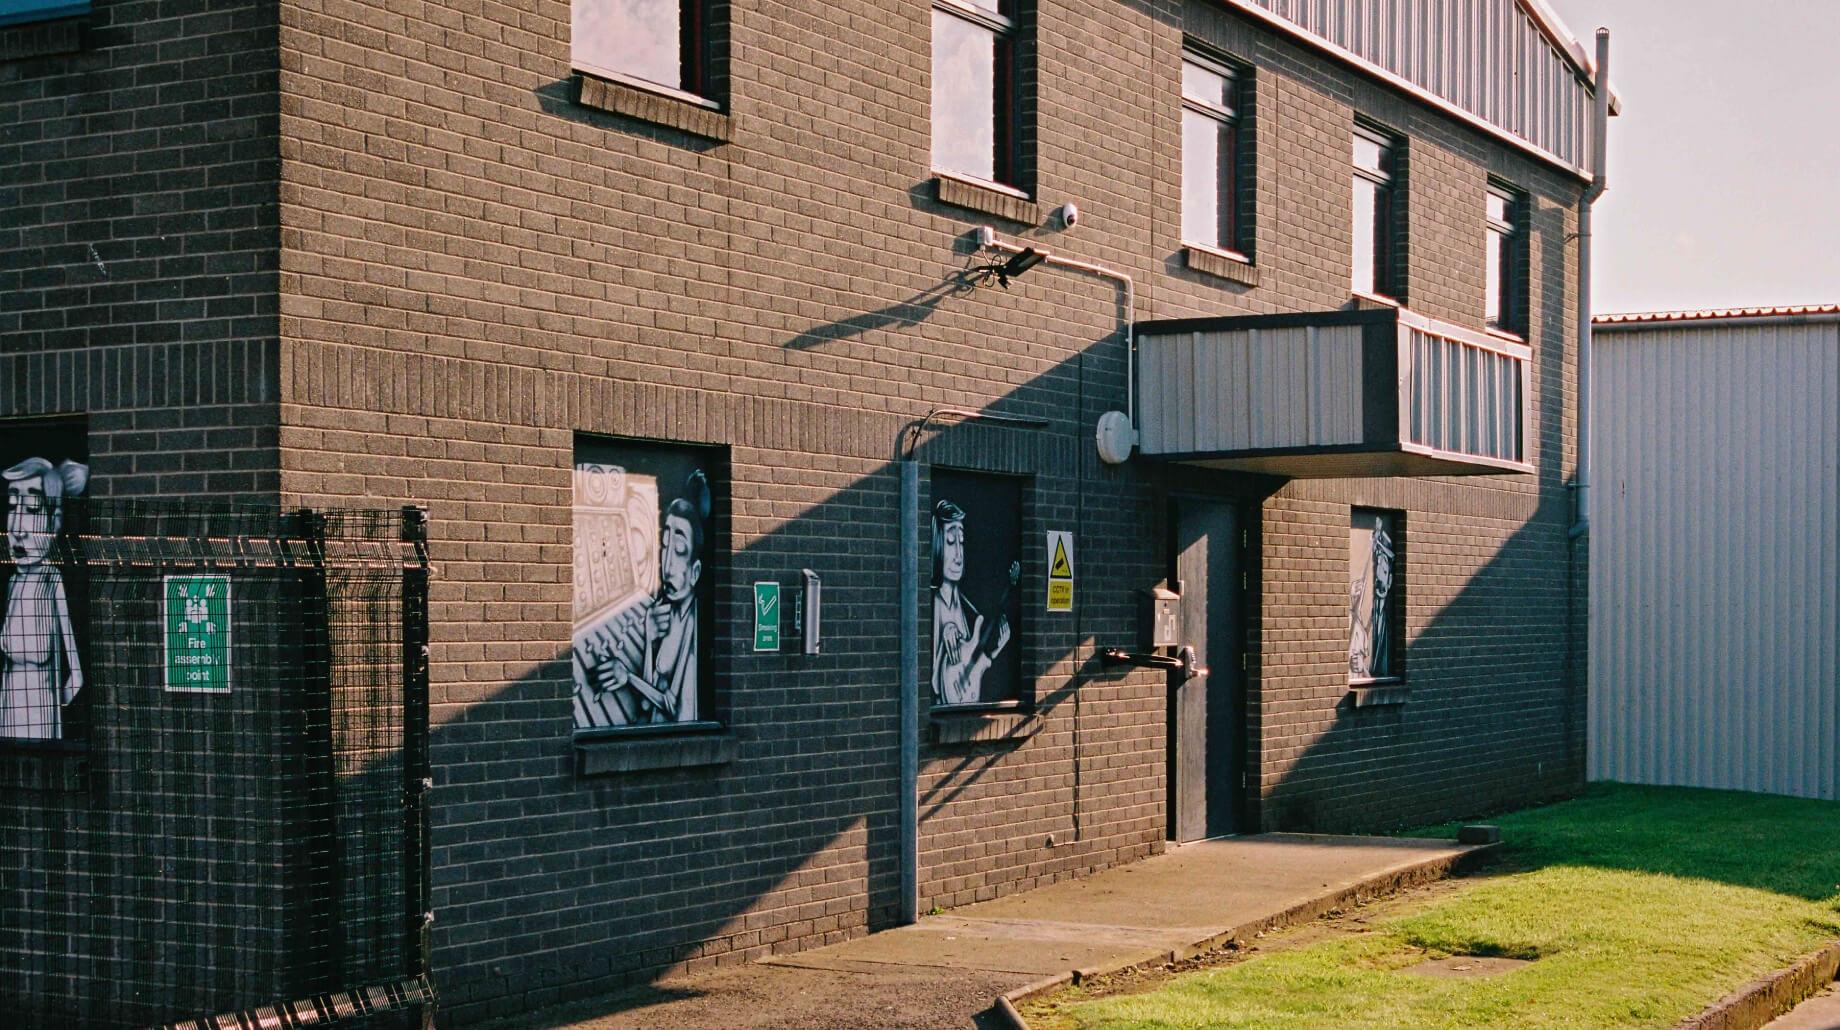 This image may contain: home decor, brick, walkway, path